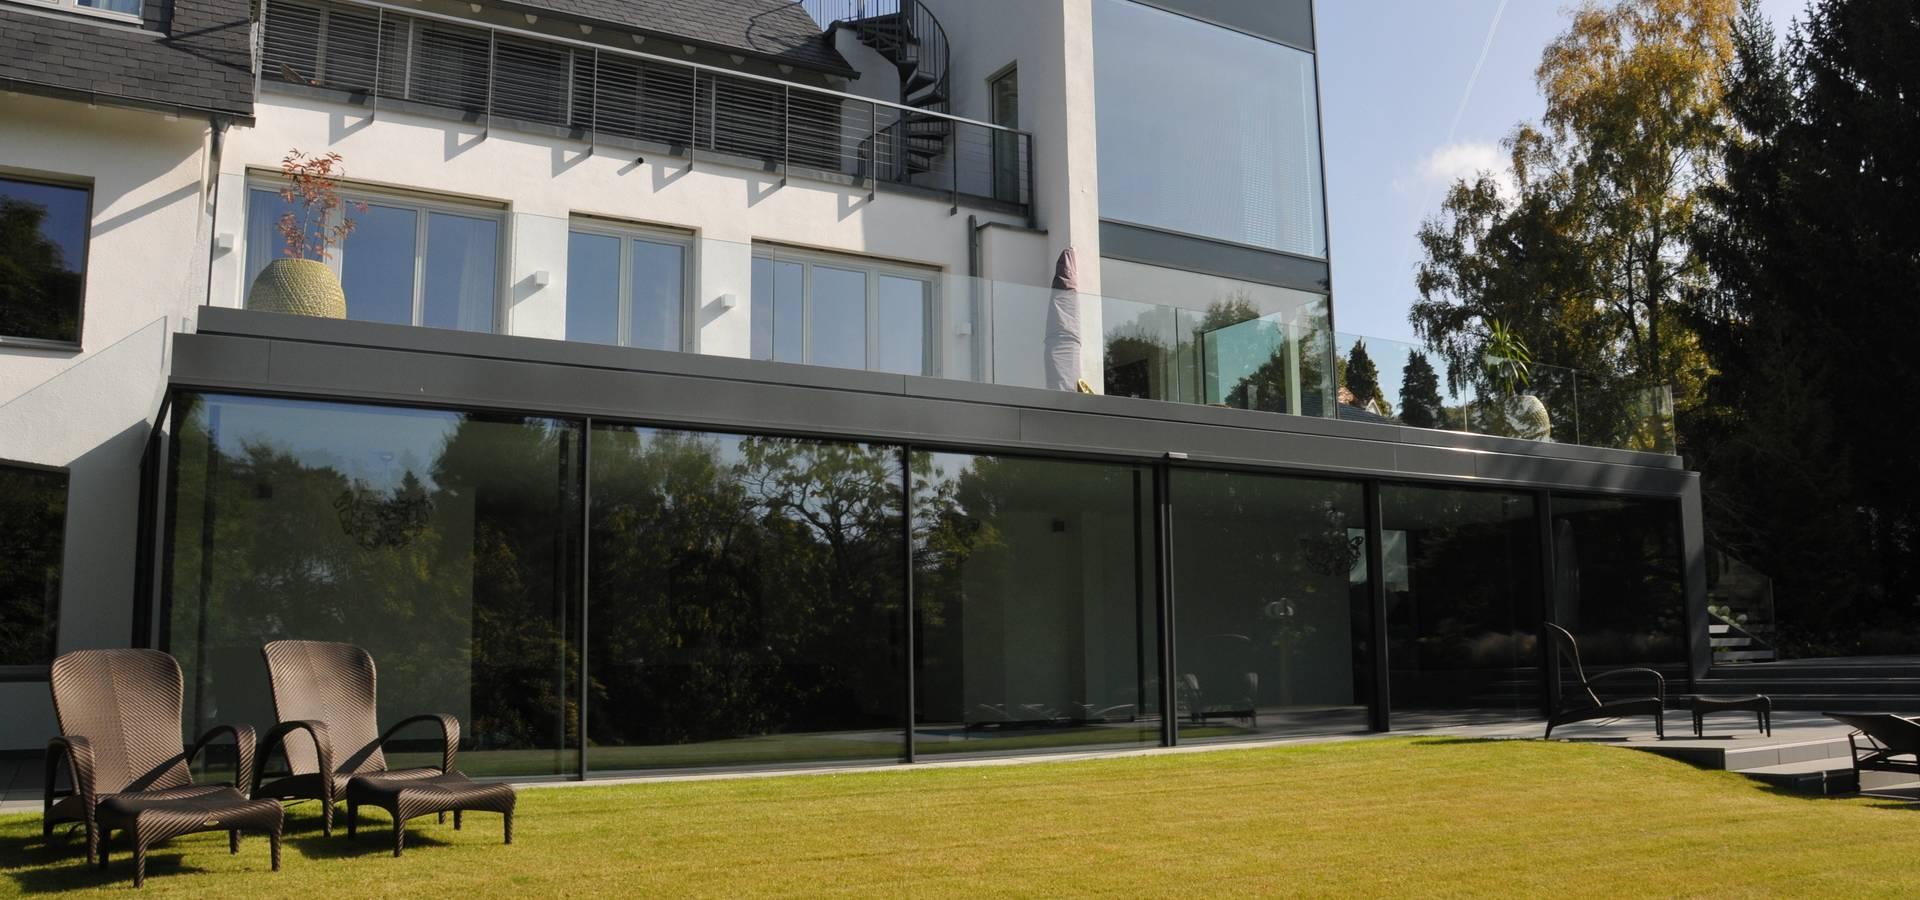 metallbau beilmann gmbh ventanas en gutenberg bei bad kreuznach homify. Black Bedroom Furniture Sets. Home Design Ideas